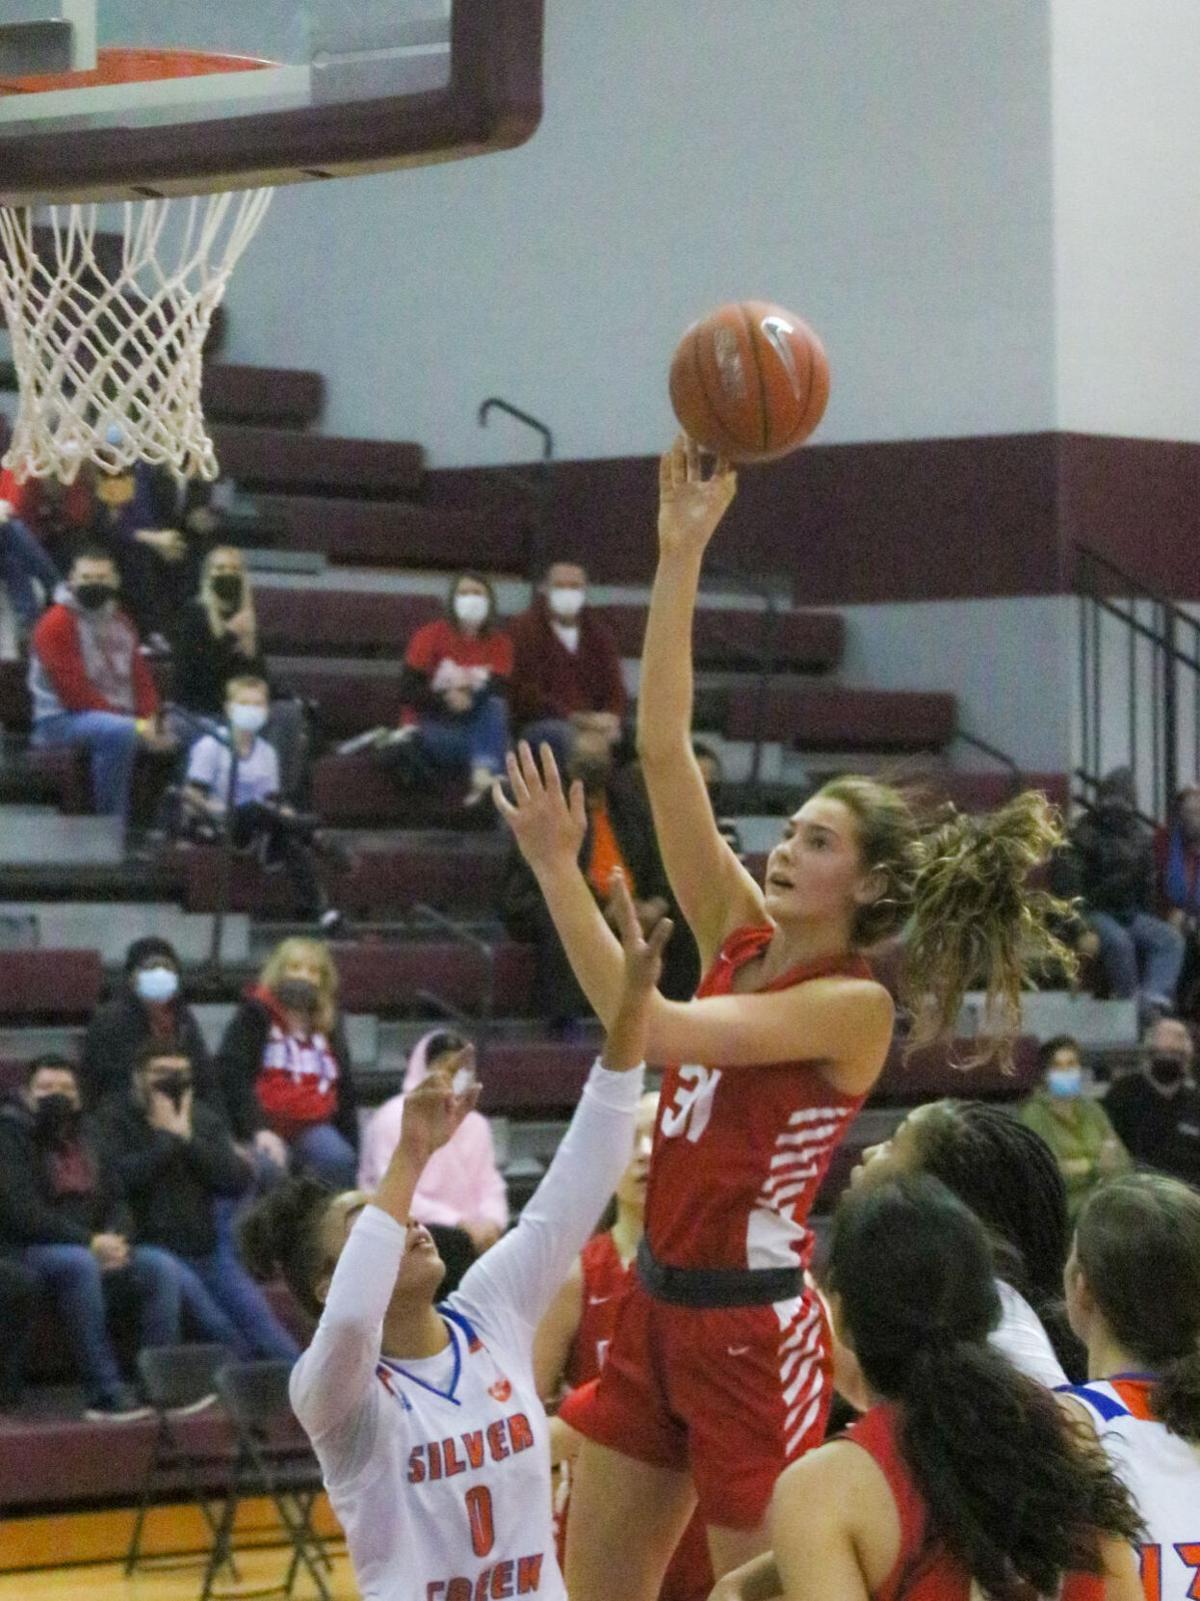 Shootout - Crown Point - Silver Creek girls basketball